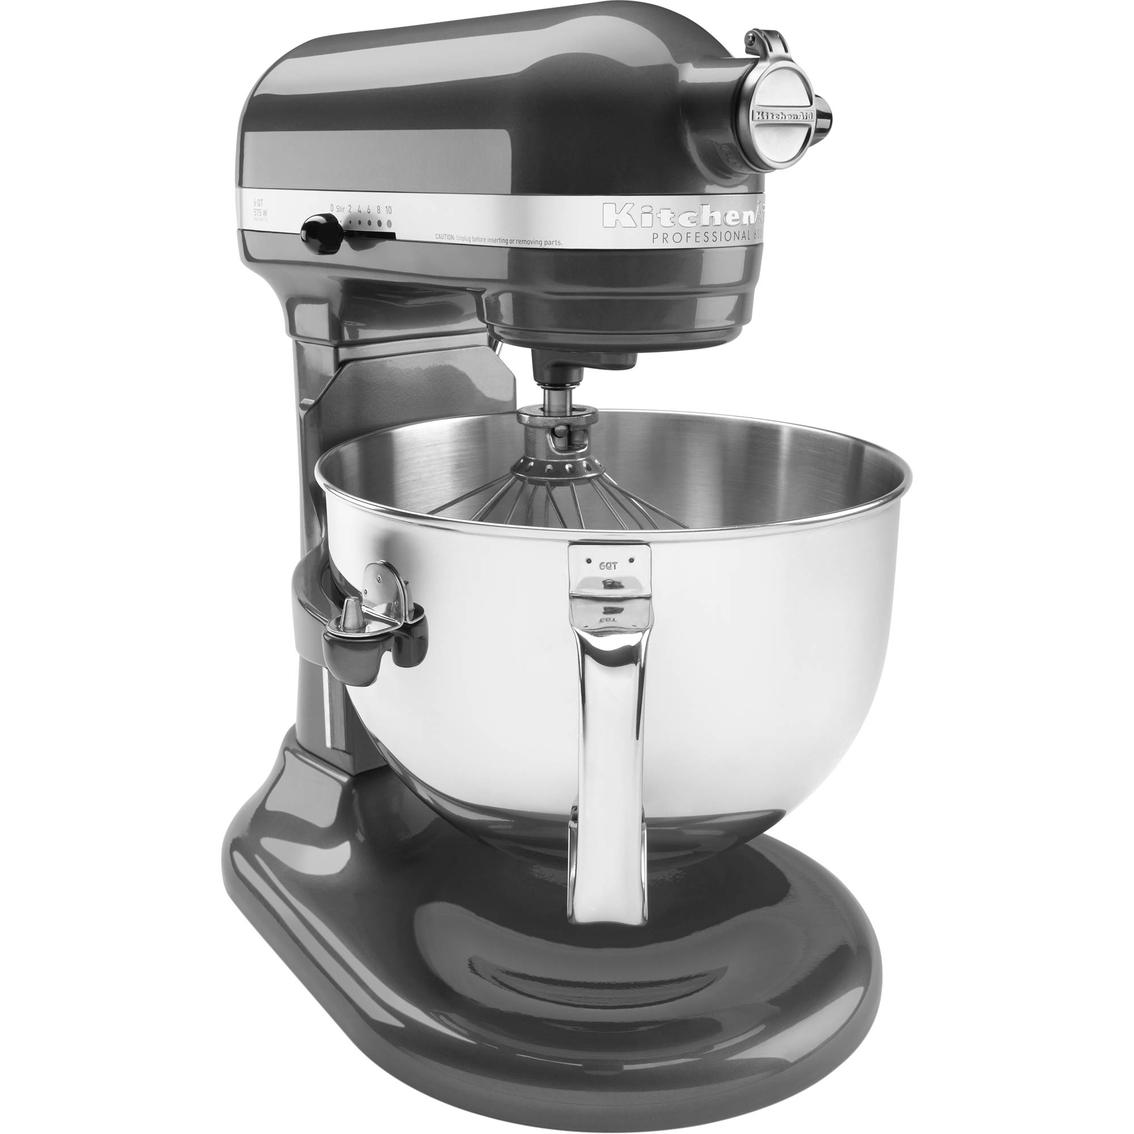 Kitchenaid Stand Mixer Designs : Kitchenaid artisan design series speed stand mixer